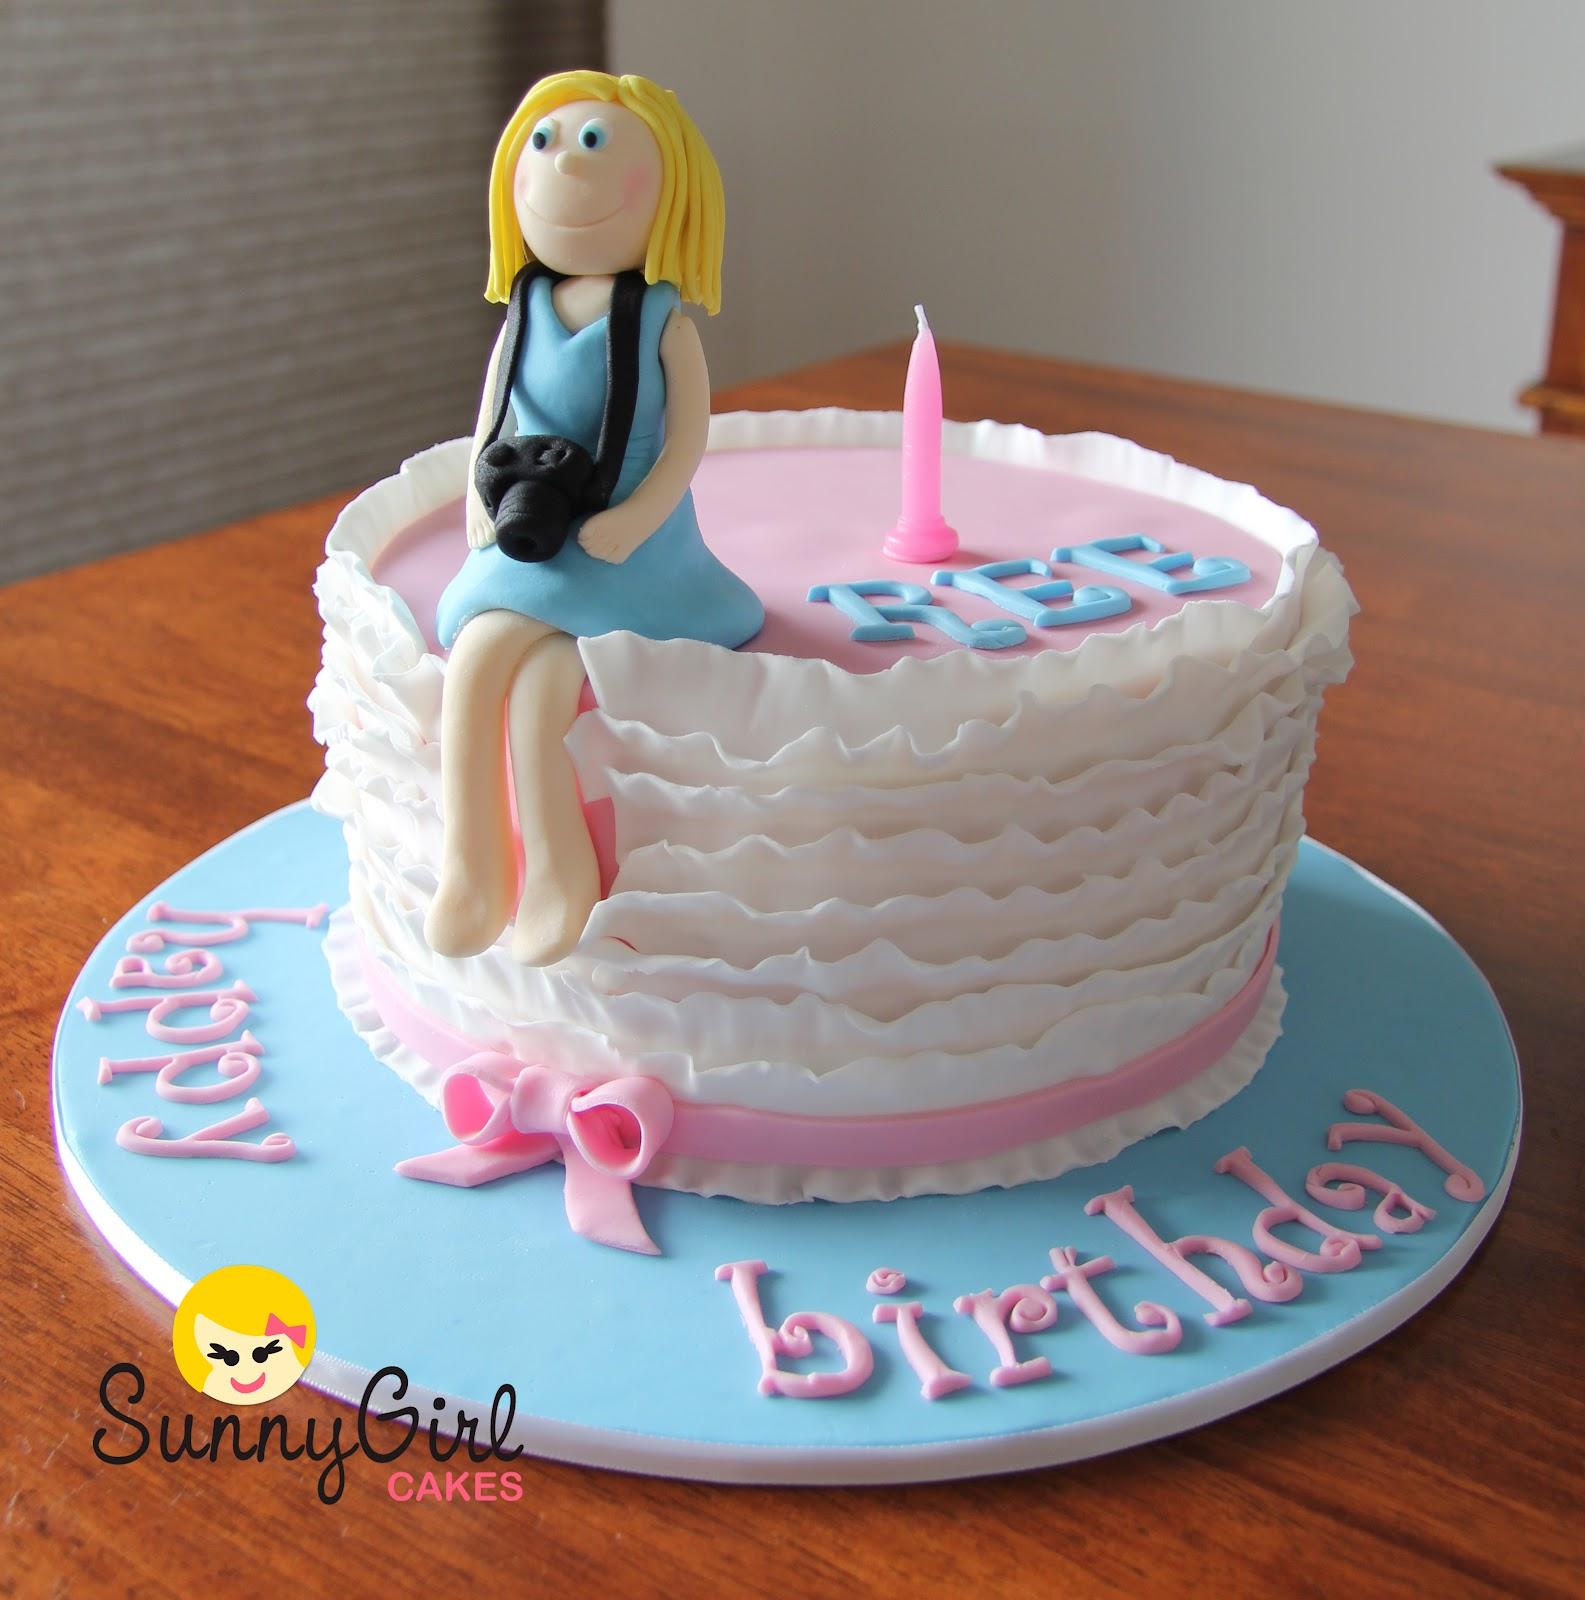 Happy Birthday Cakes For Girls: Happy BIrthday Ree